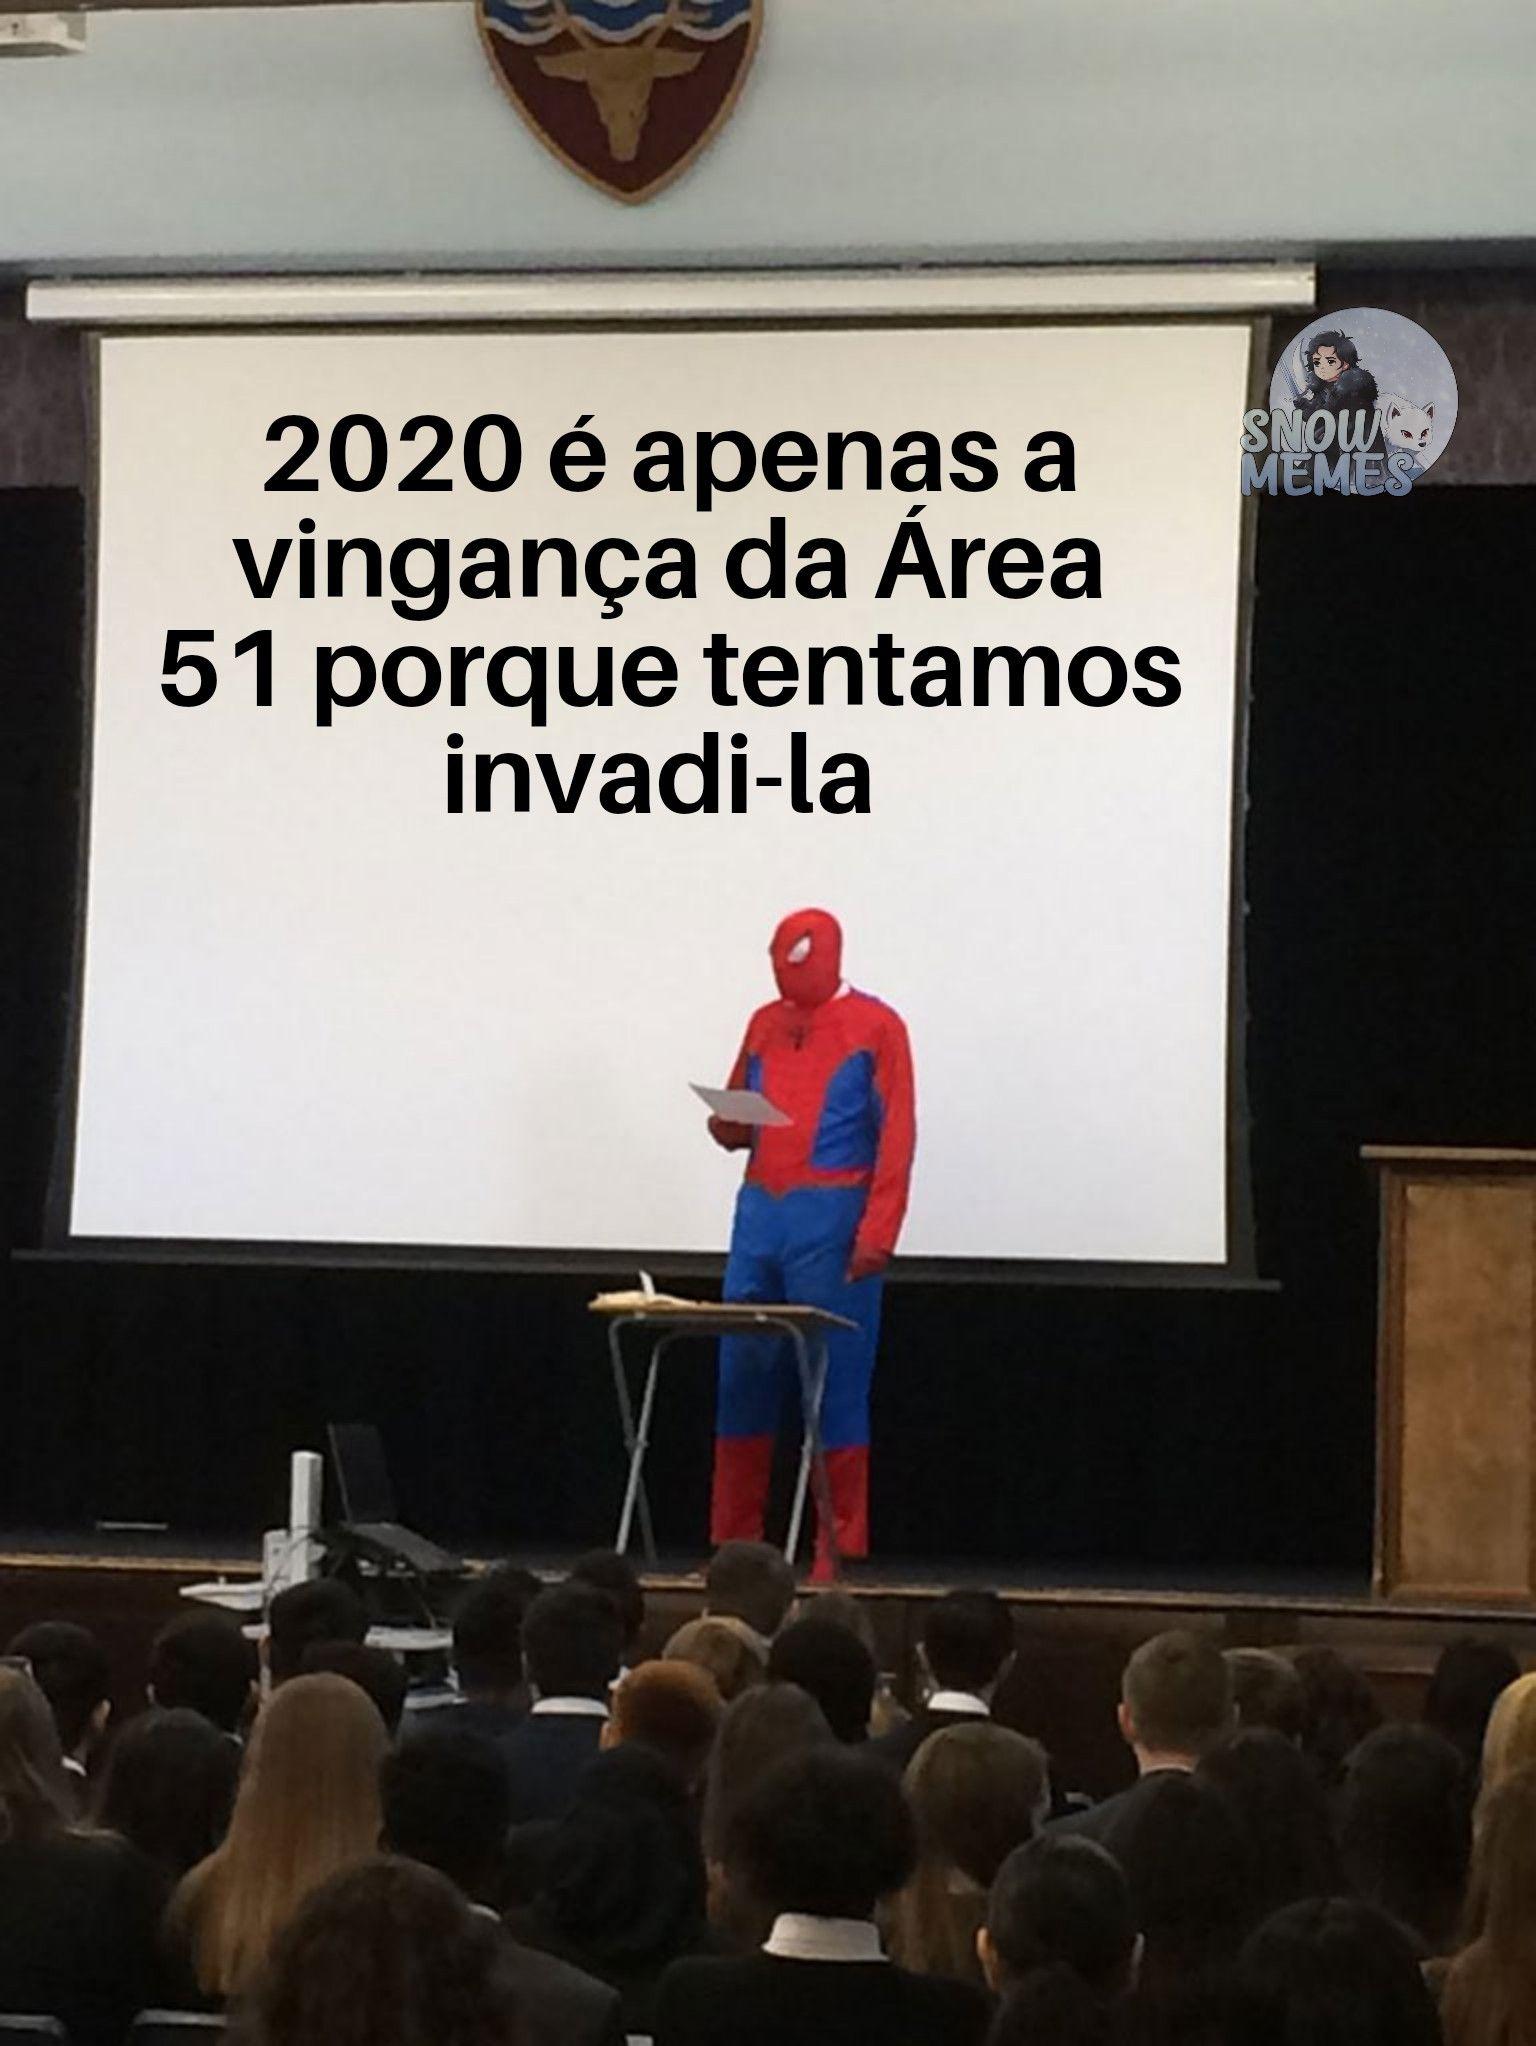 memes brasileiro in 2020 Funny memes, Funny facts, Funny